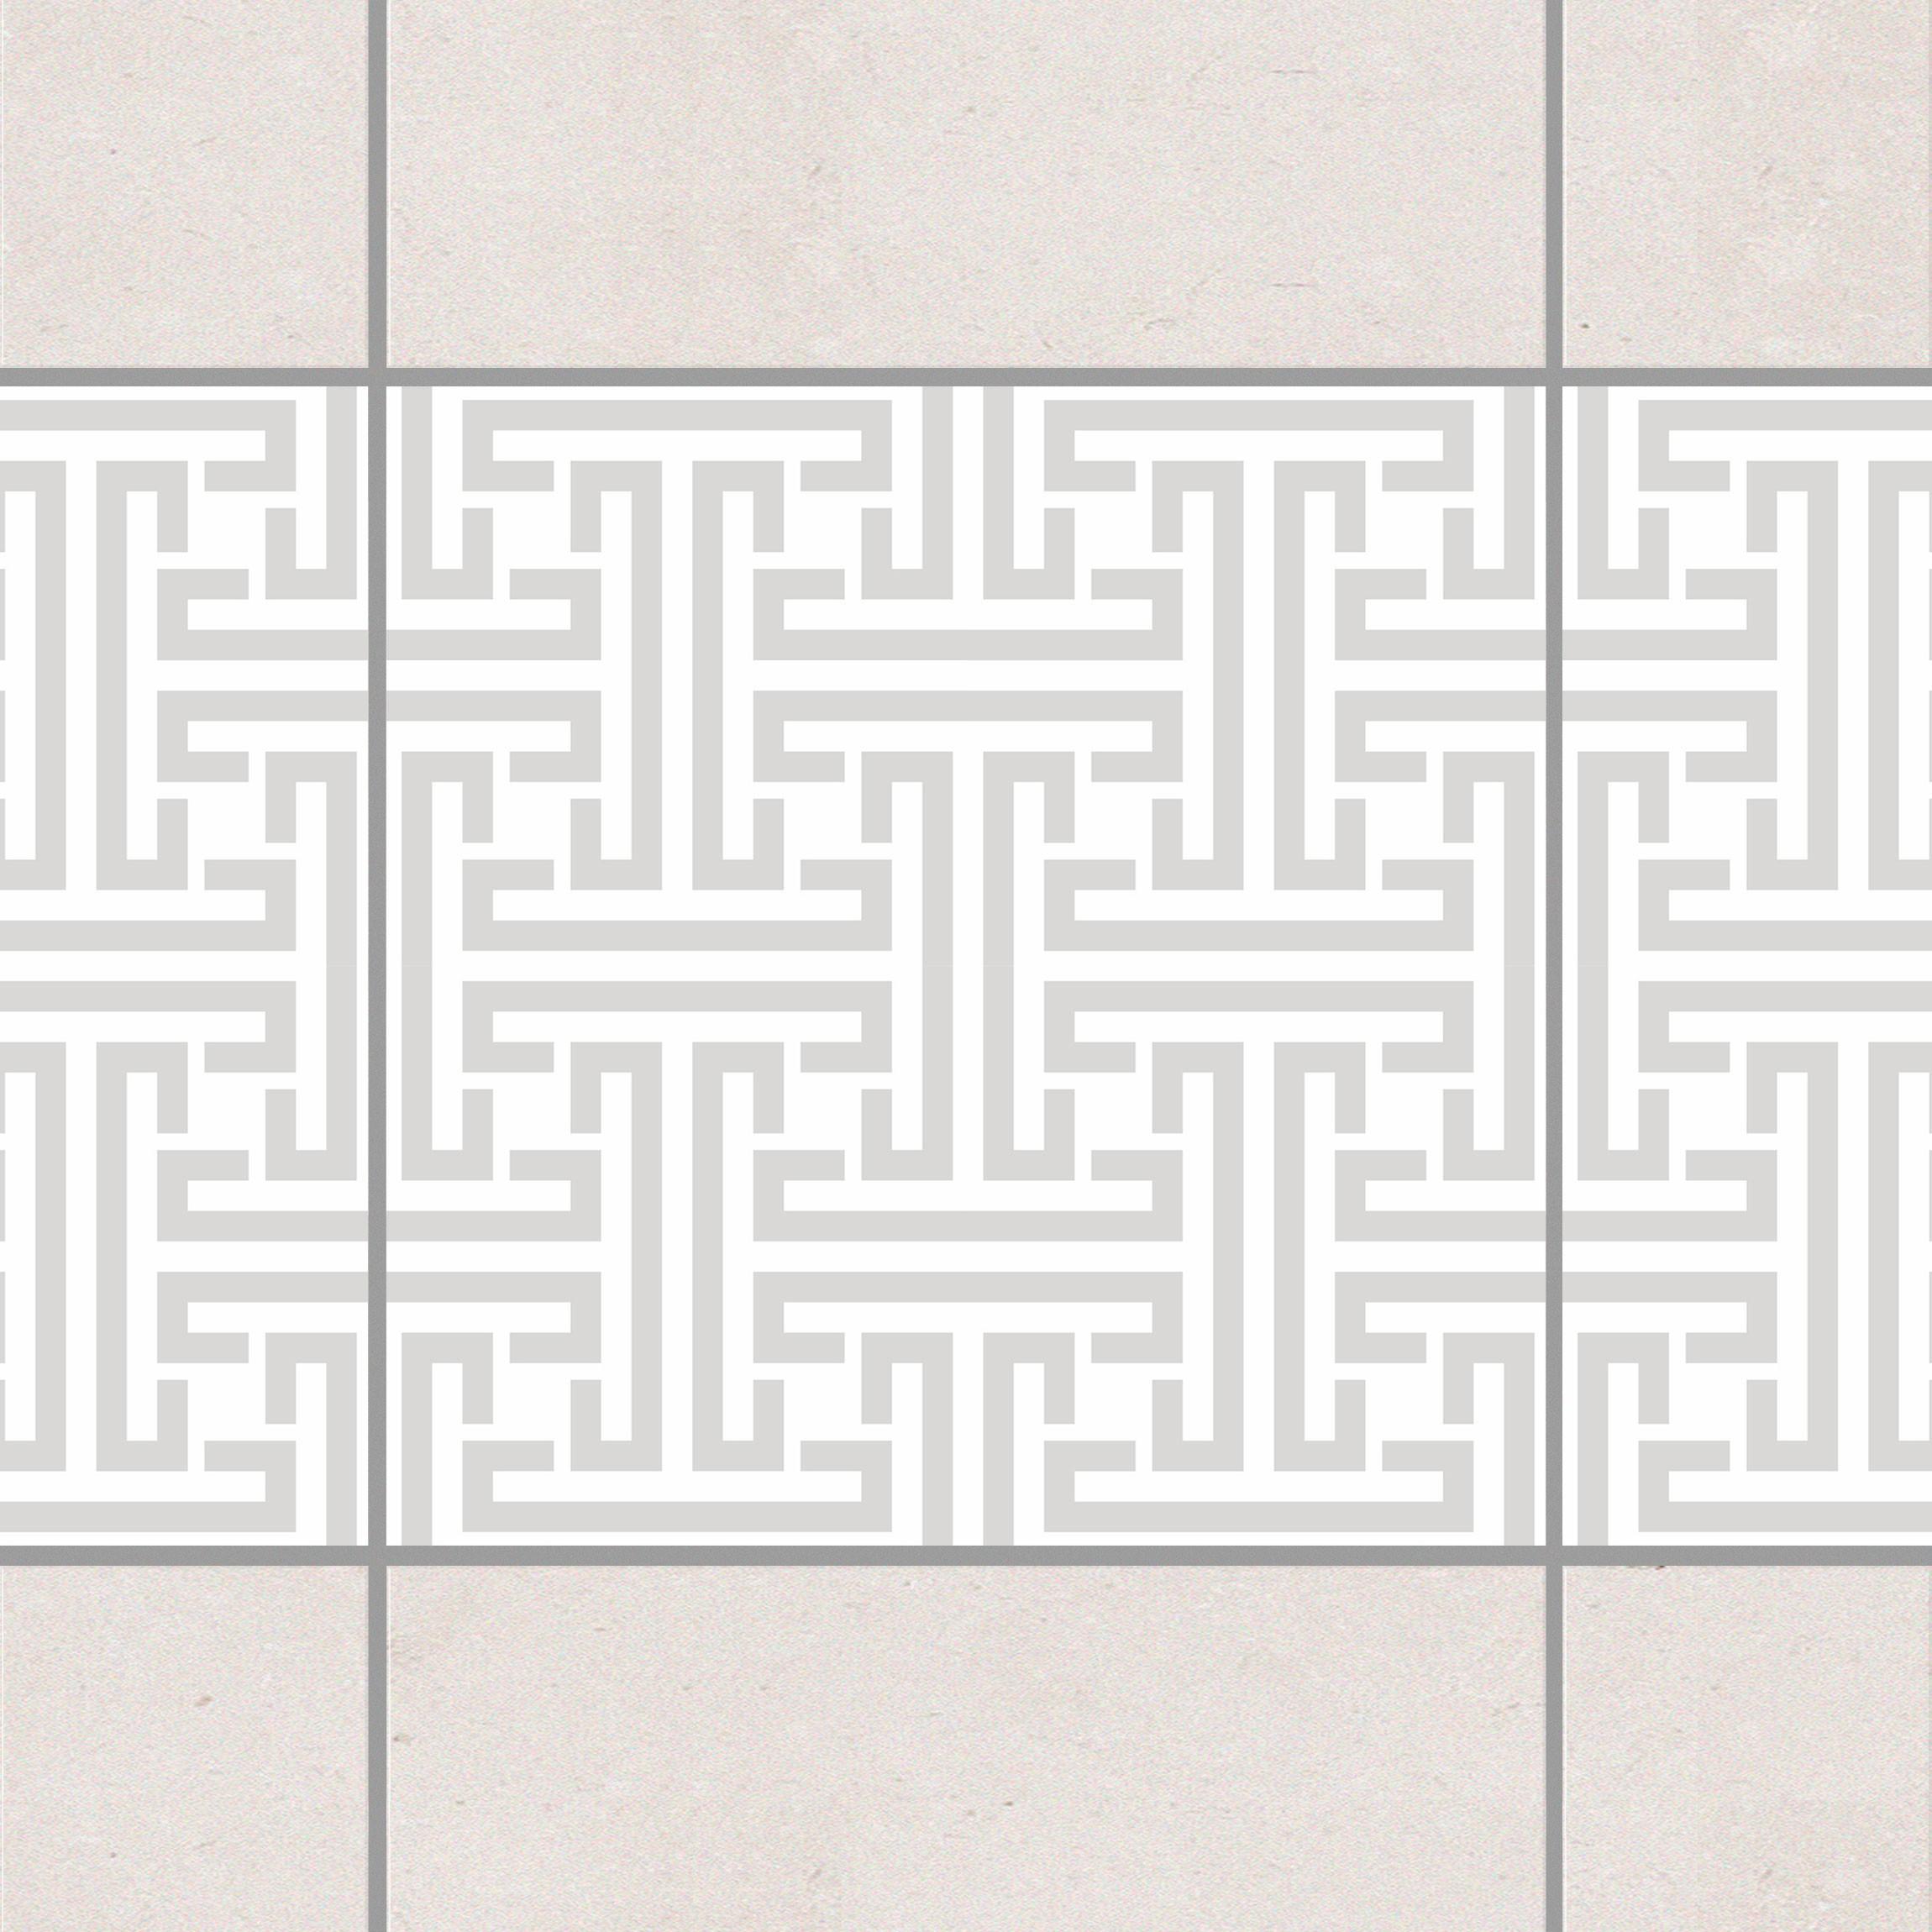 fliesen bord re dekoratives labyrinth light grey 10x10 cm fliesenaufkleber grau. Black Bedroom Furniture Sets. Home Design Ideas